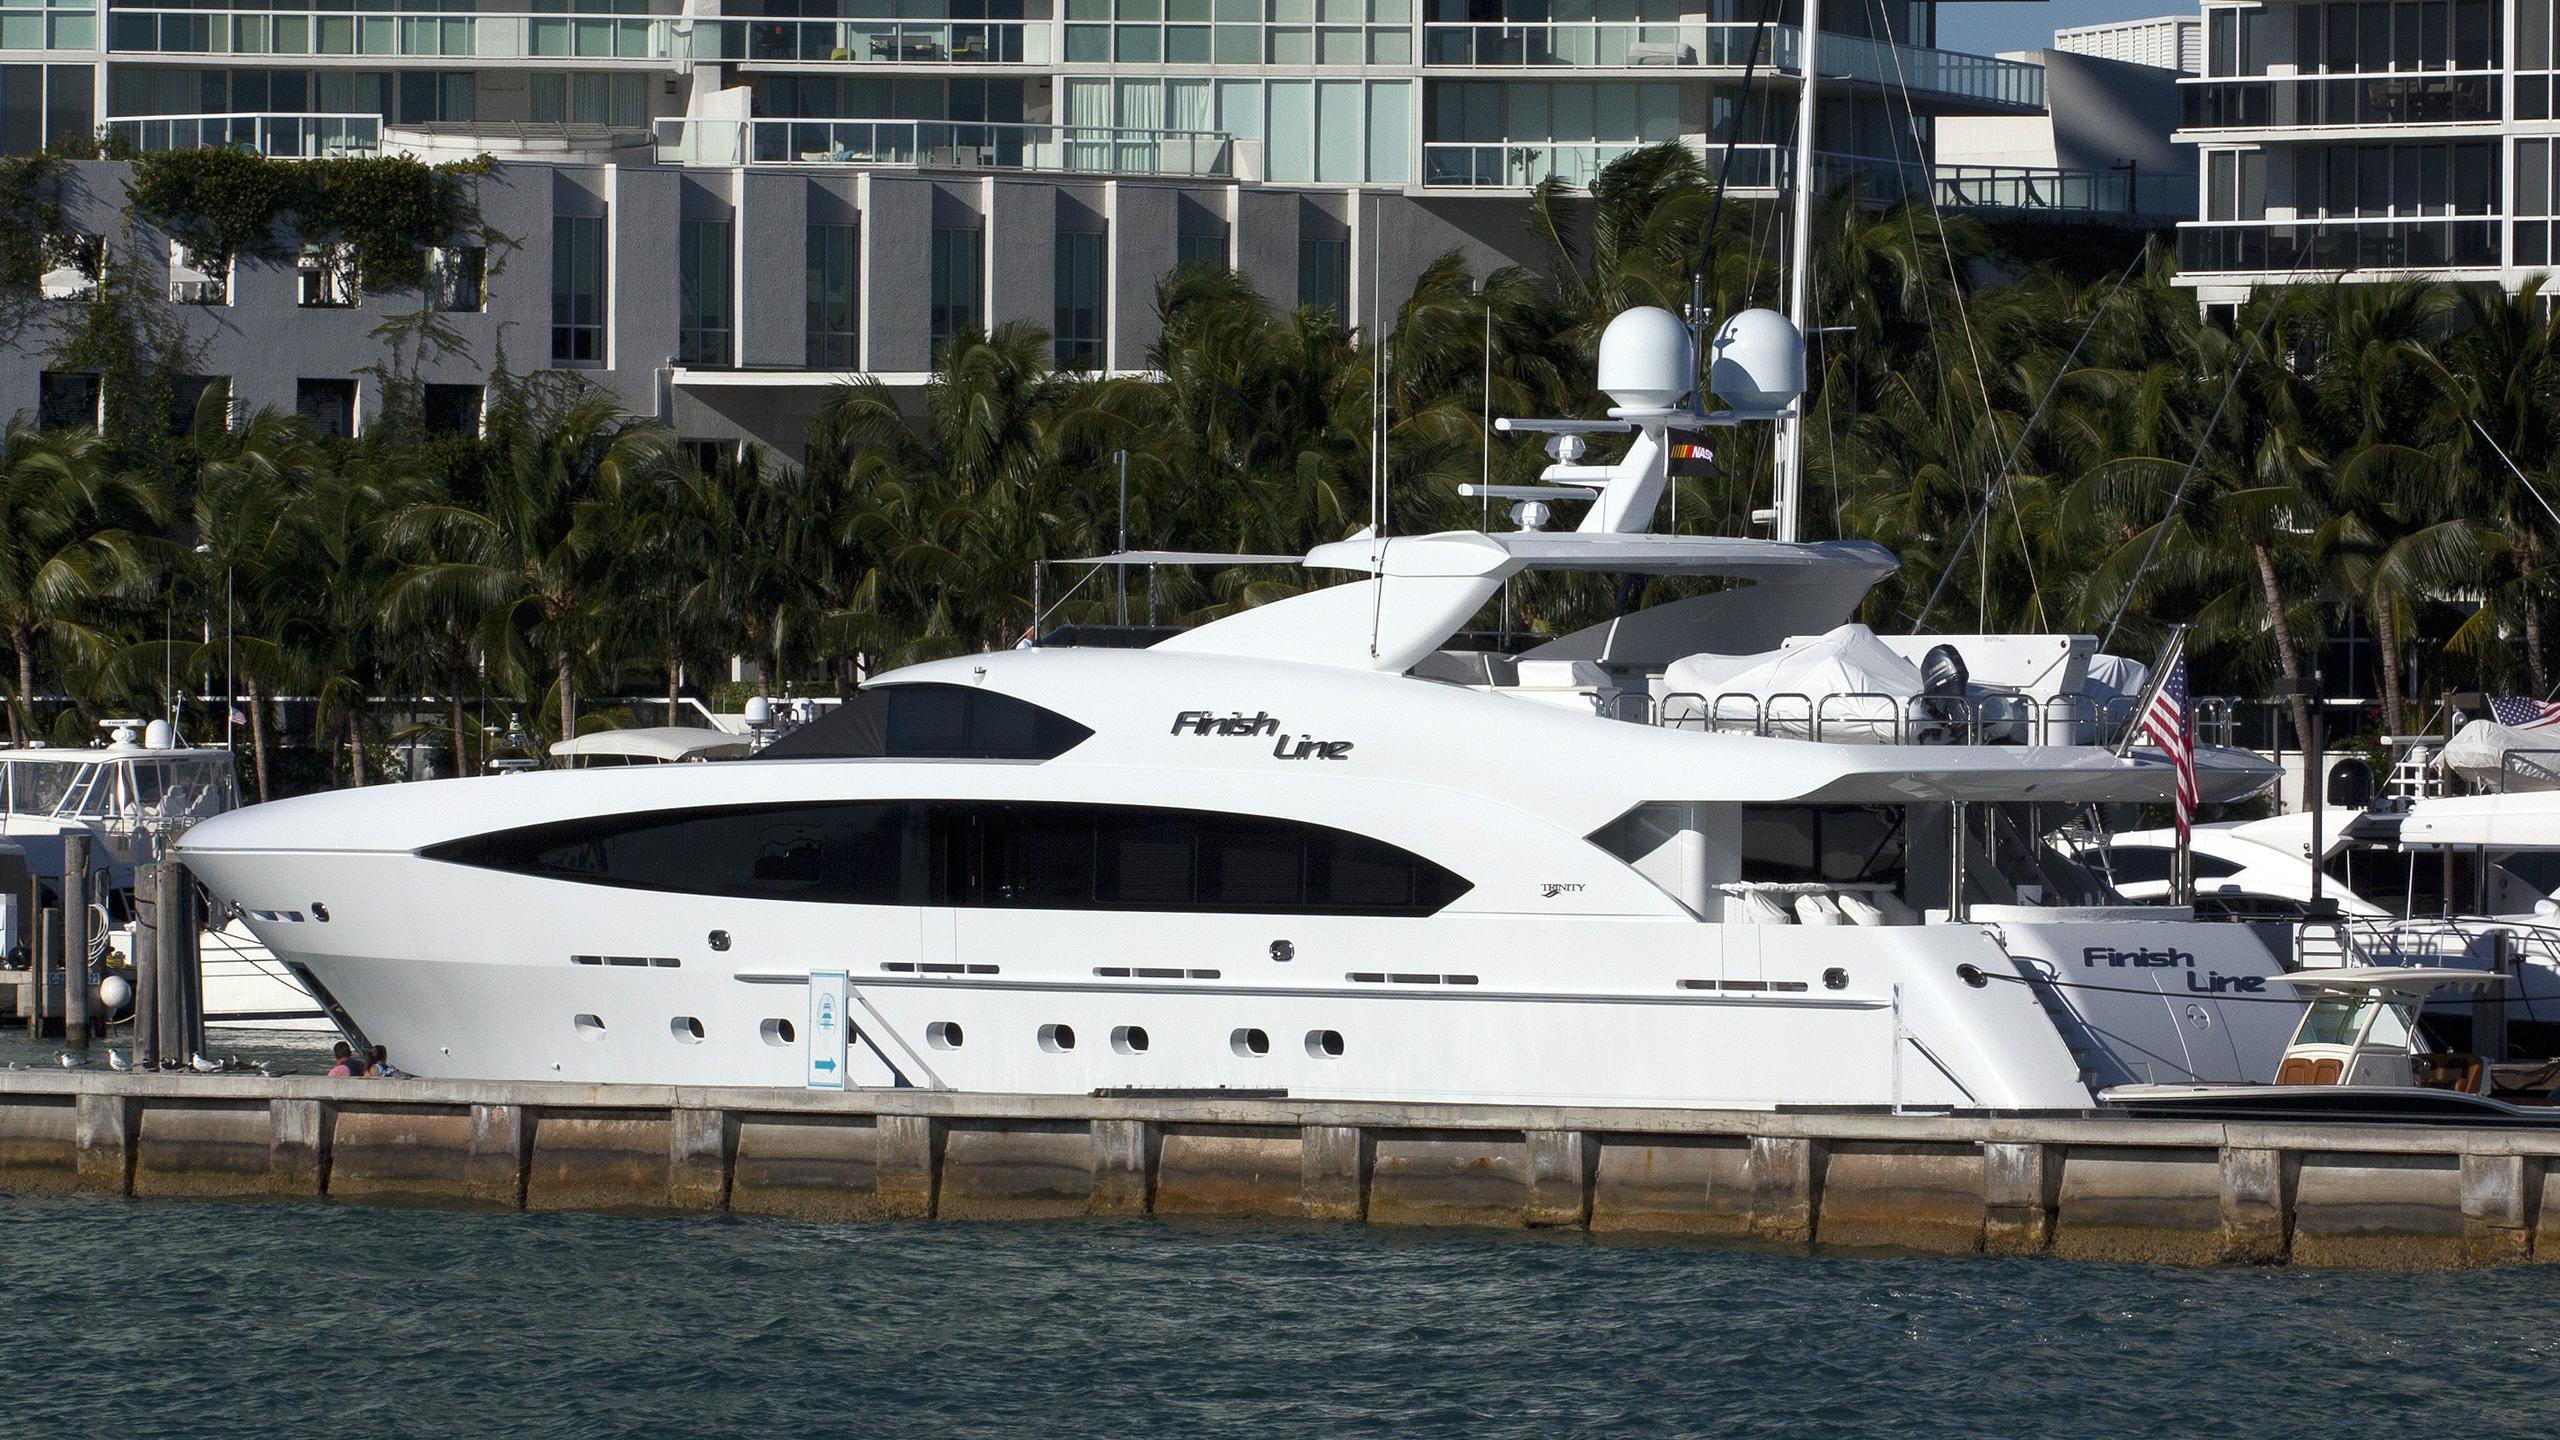 finish-line-motor-yacht-trinity-2013-37m-moored-profile